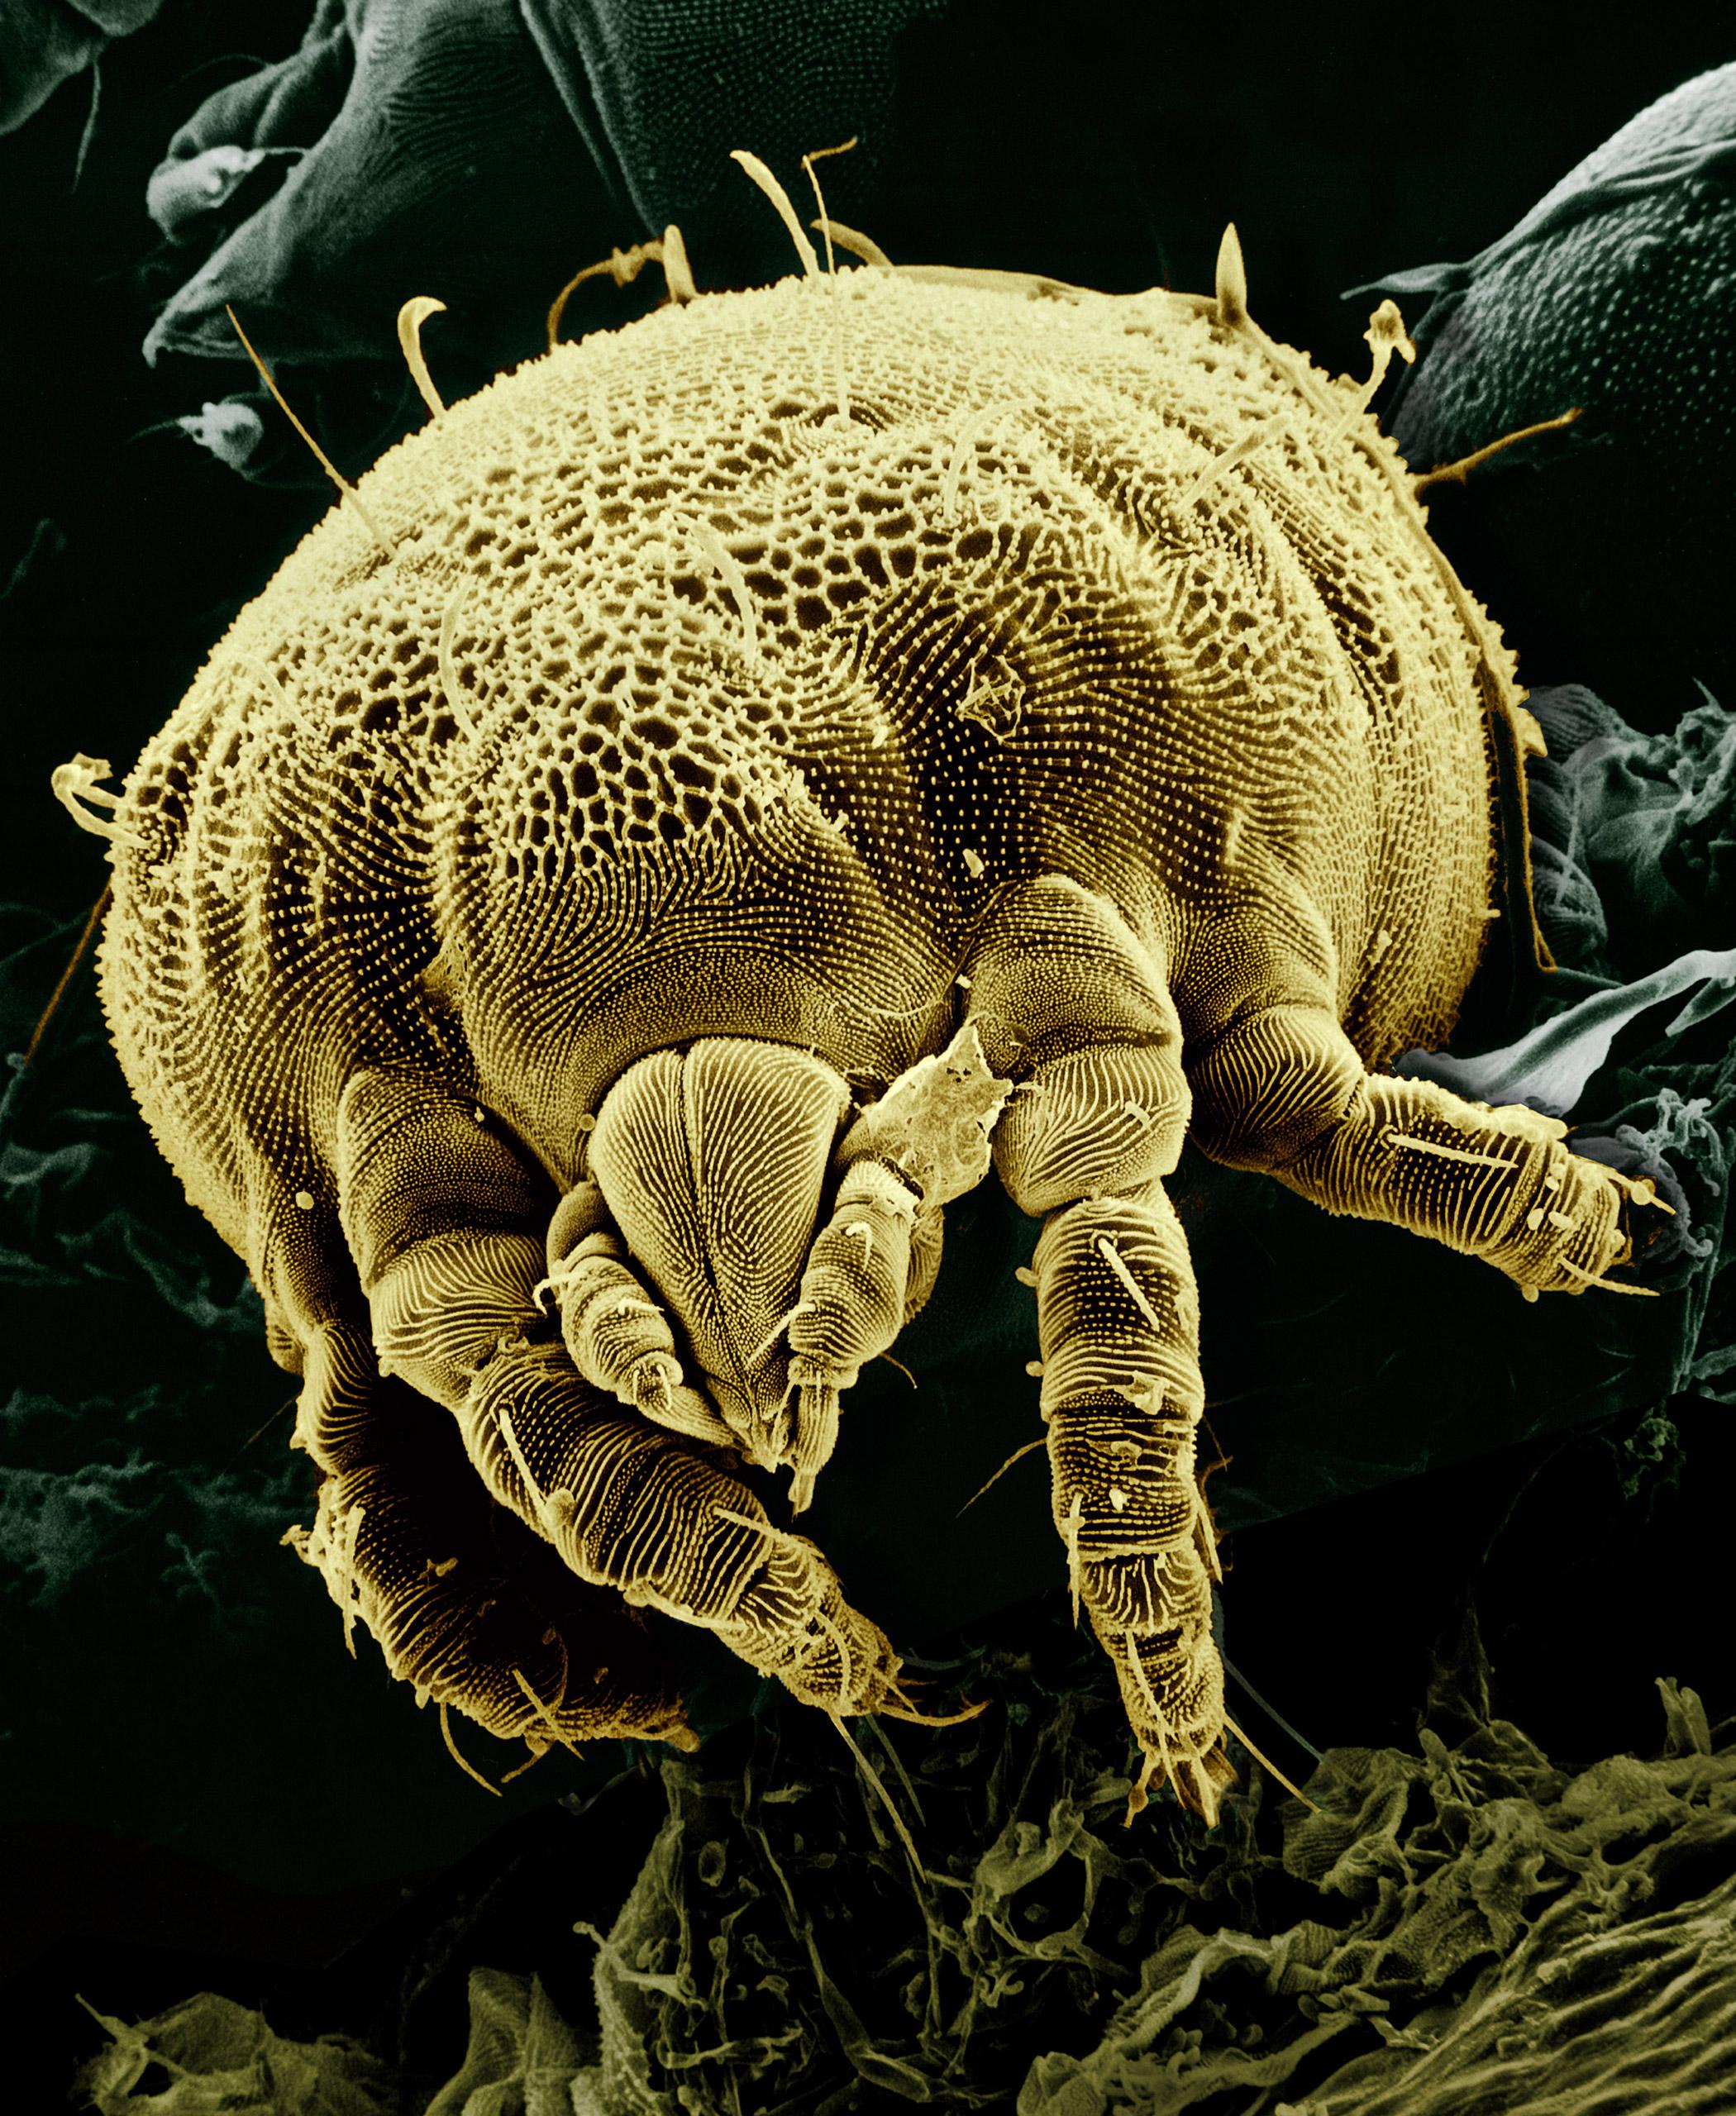 Yellow_mite_(Tydeidae)_Lorryia_formosa_2_edit.jpg